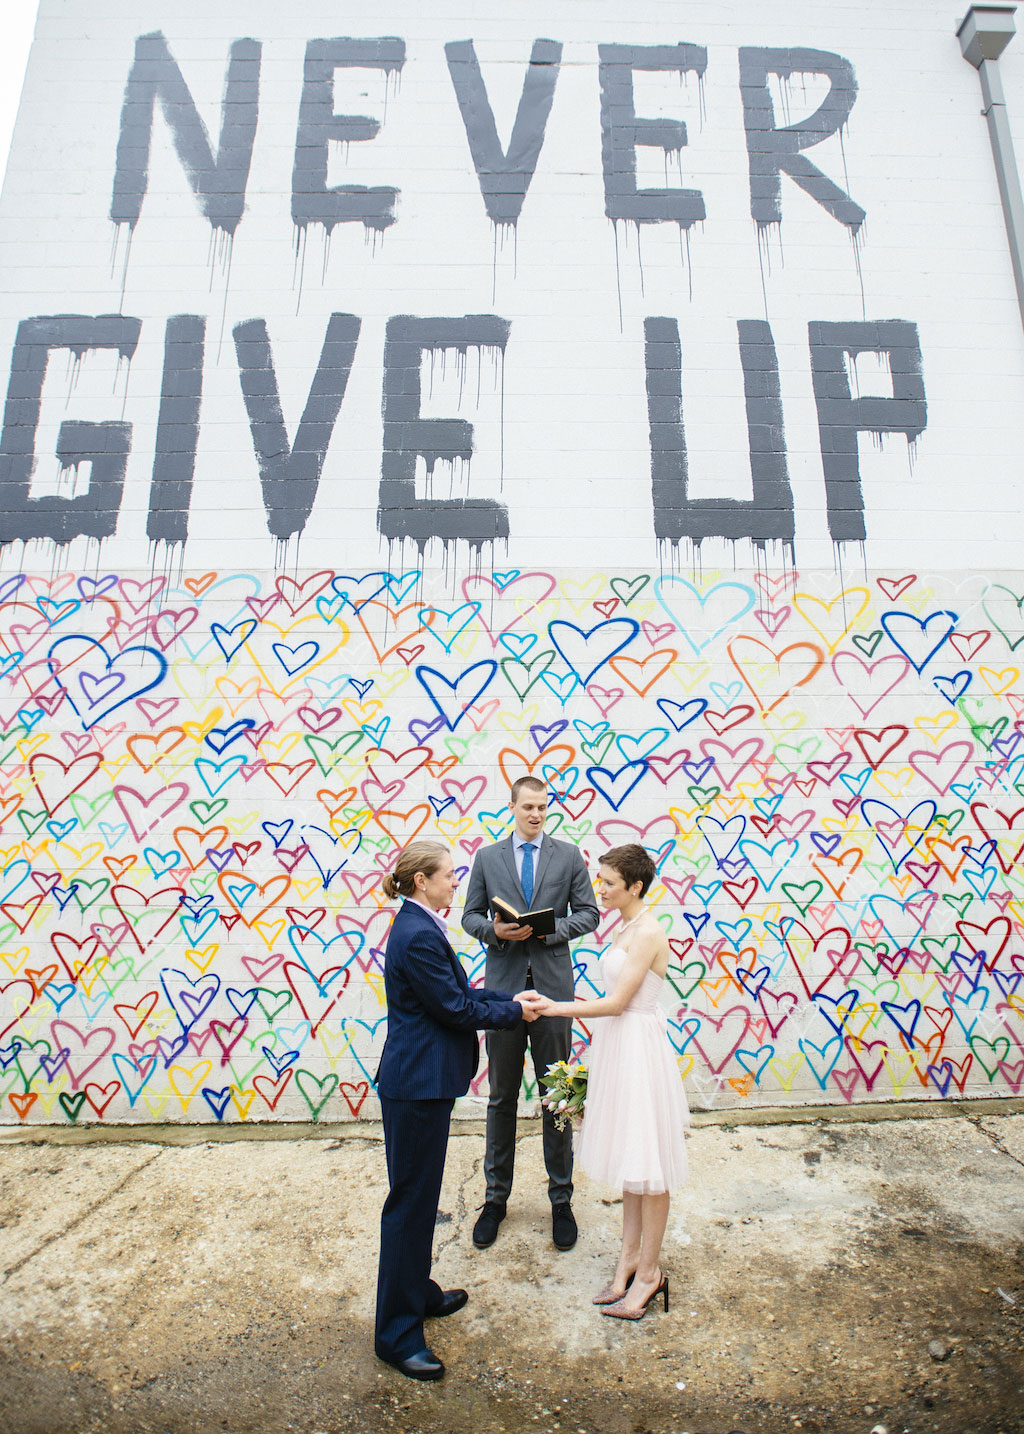 9-9-16-pop-up-wedding-union-market-murals-2